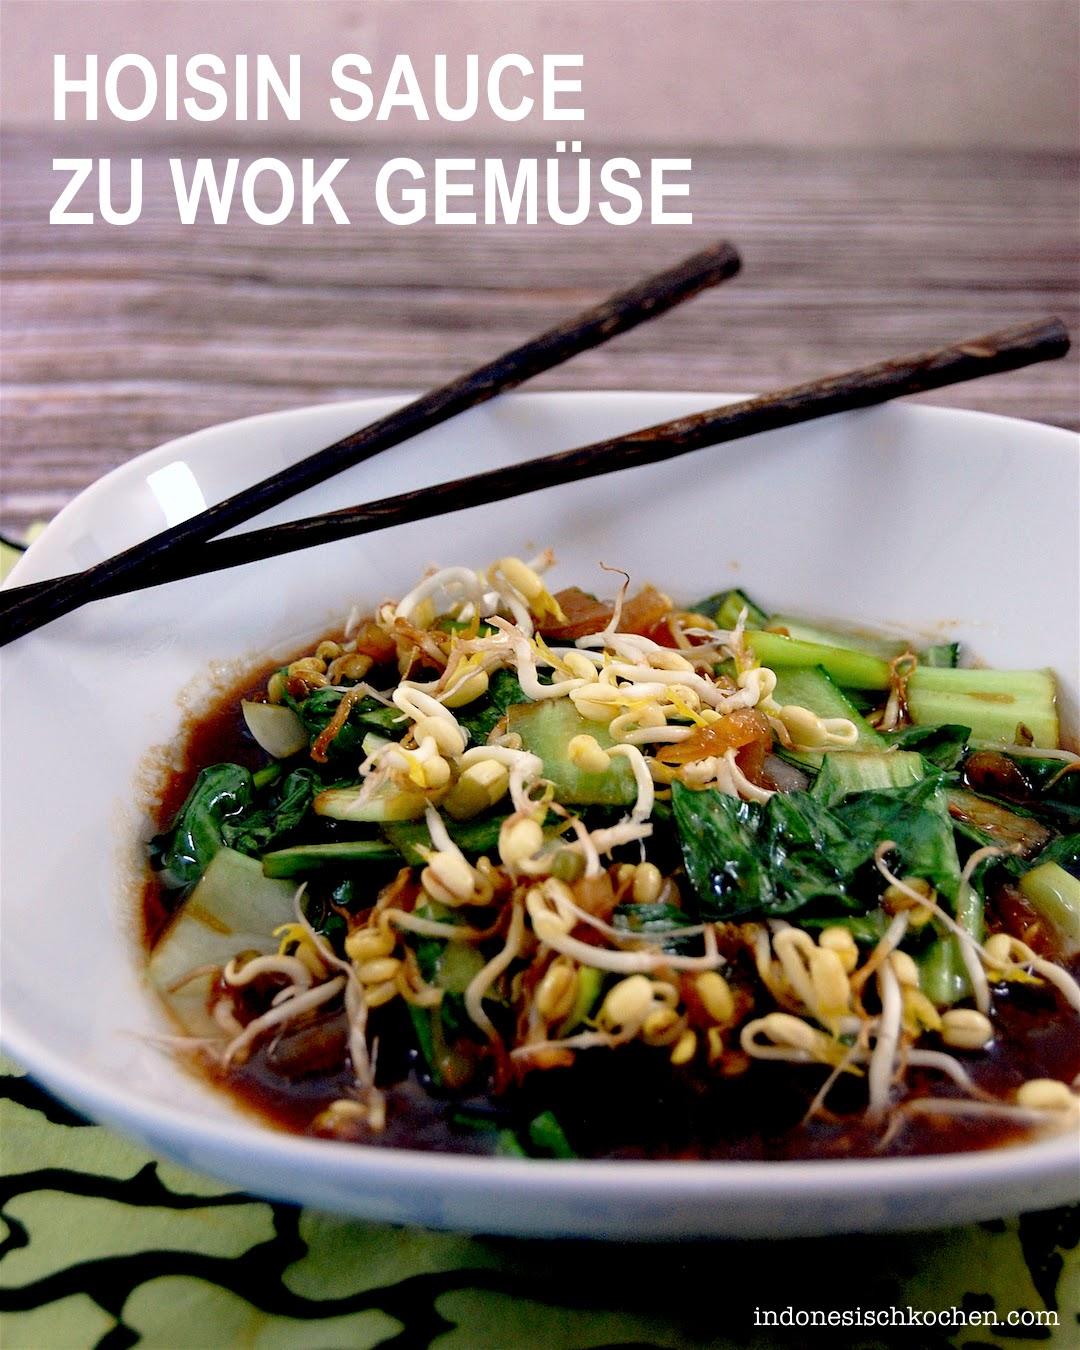 Rezept Hoisin Sauce zu Wok Gemüse asiatisch